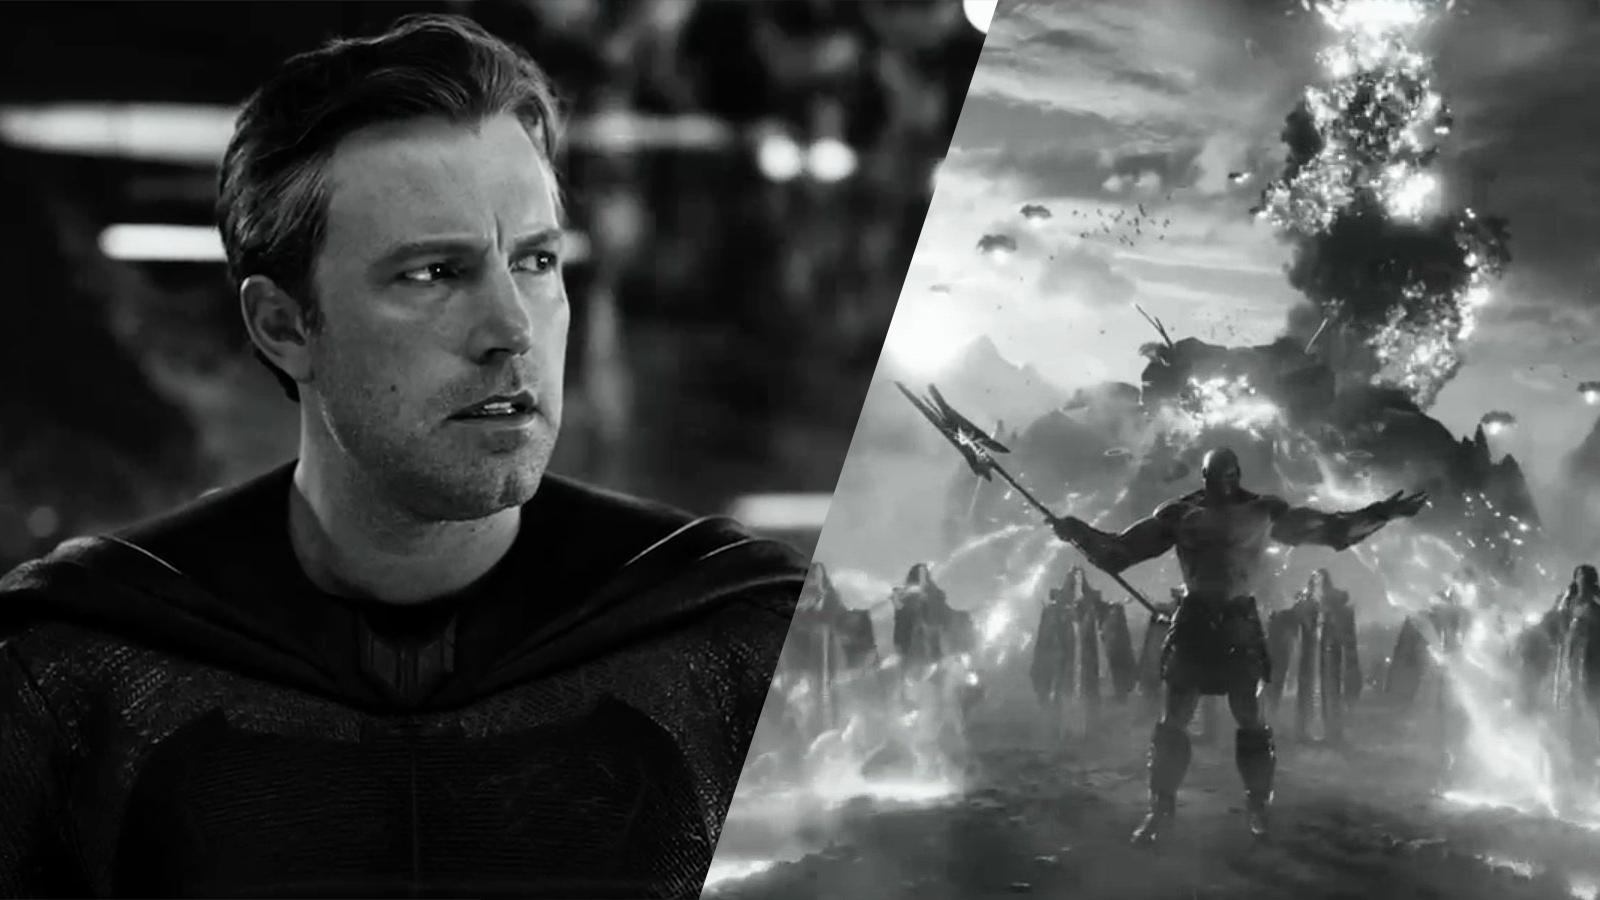 Zack Snyder Justice League trailer Darkseid